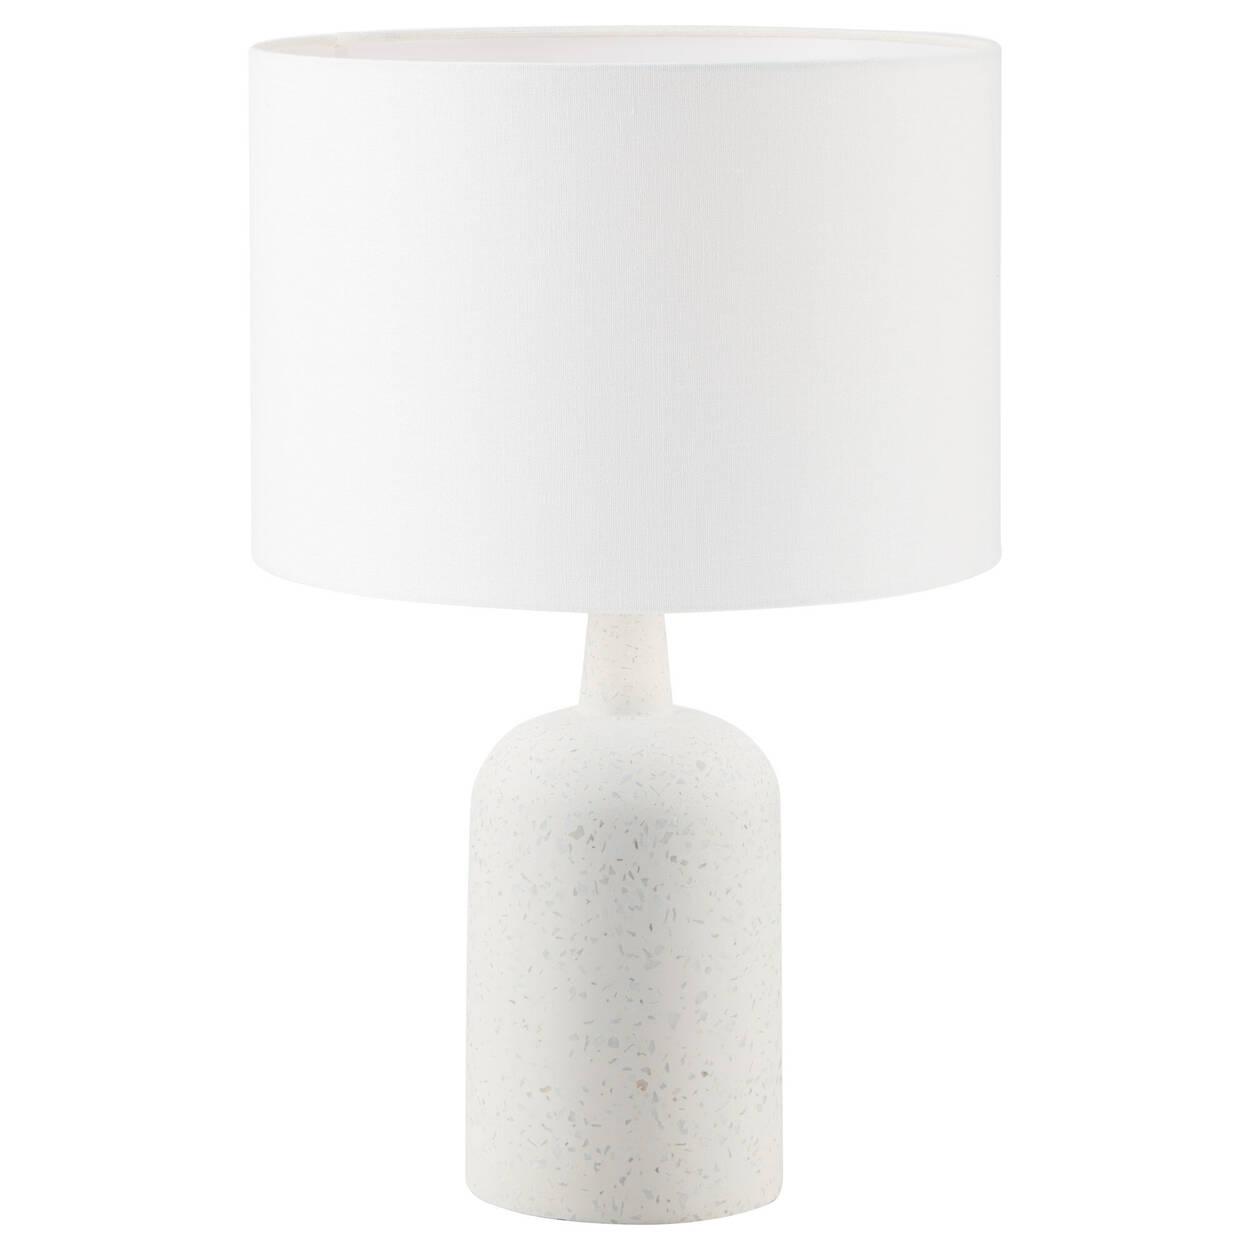 Speckled Ceramic Table Lamp